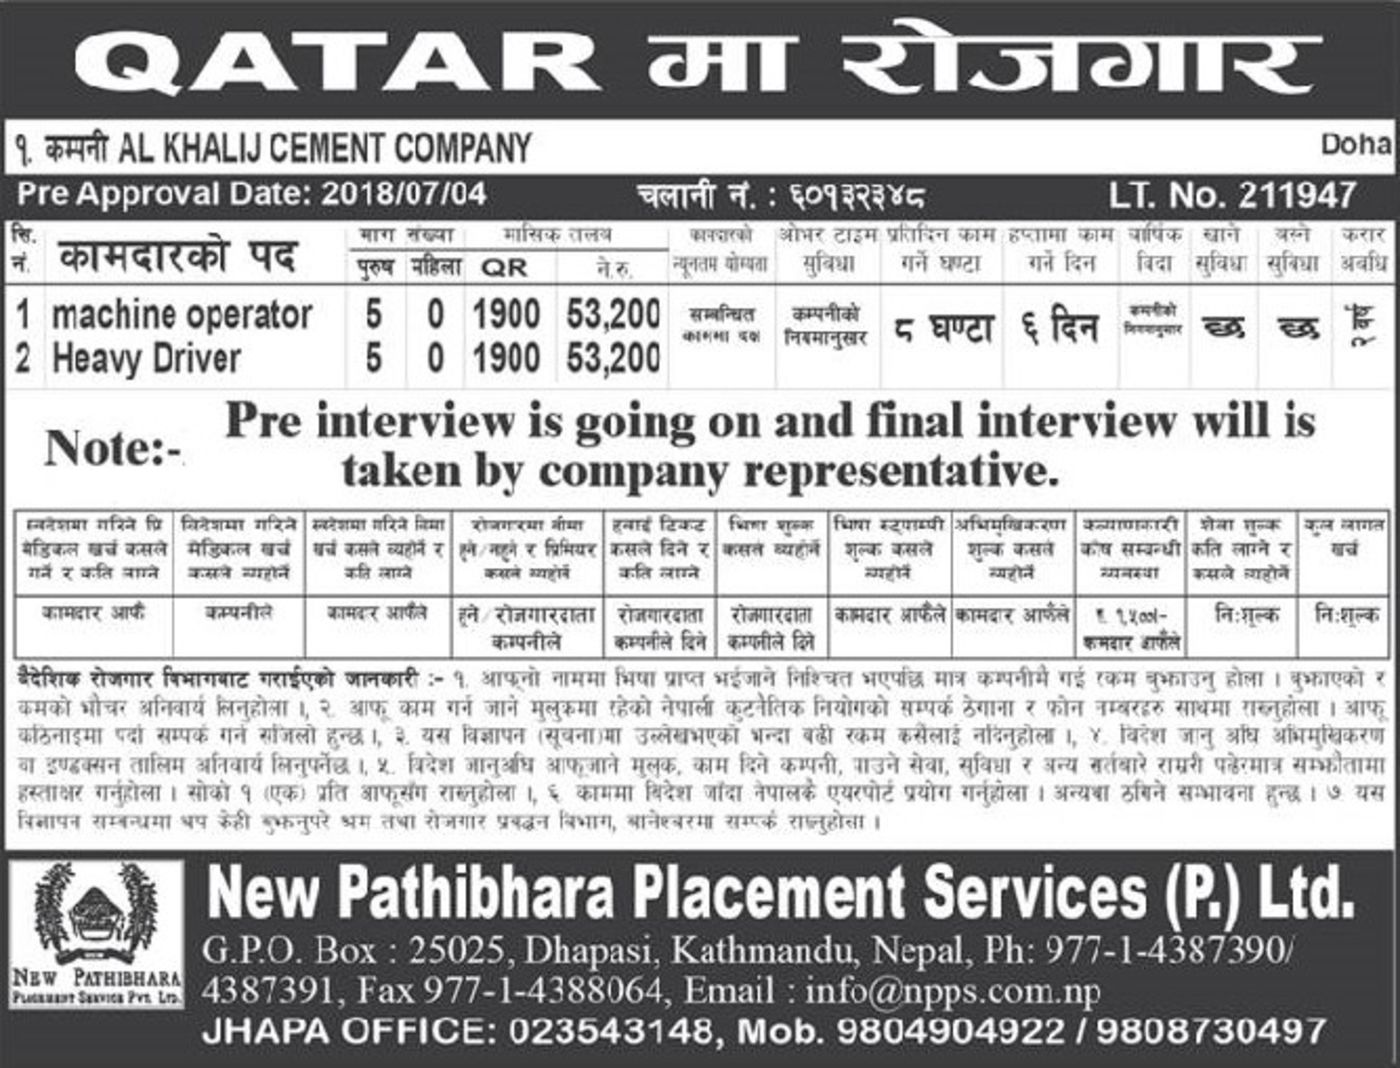 Jobs Nepal - Vacancy - Machine Operator, Heavy Driver - AL